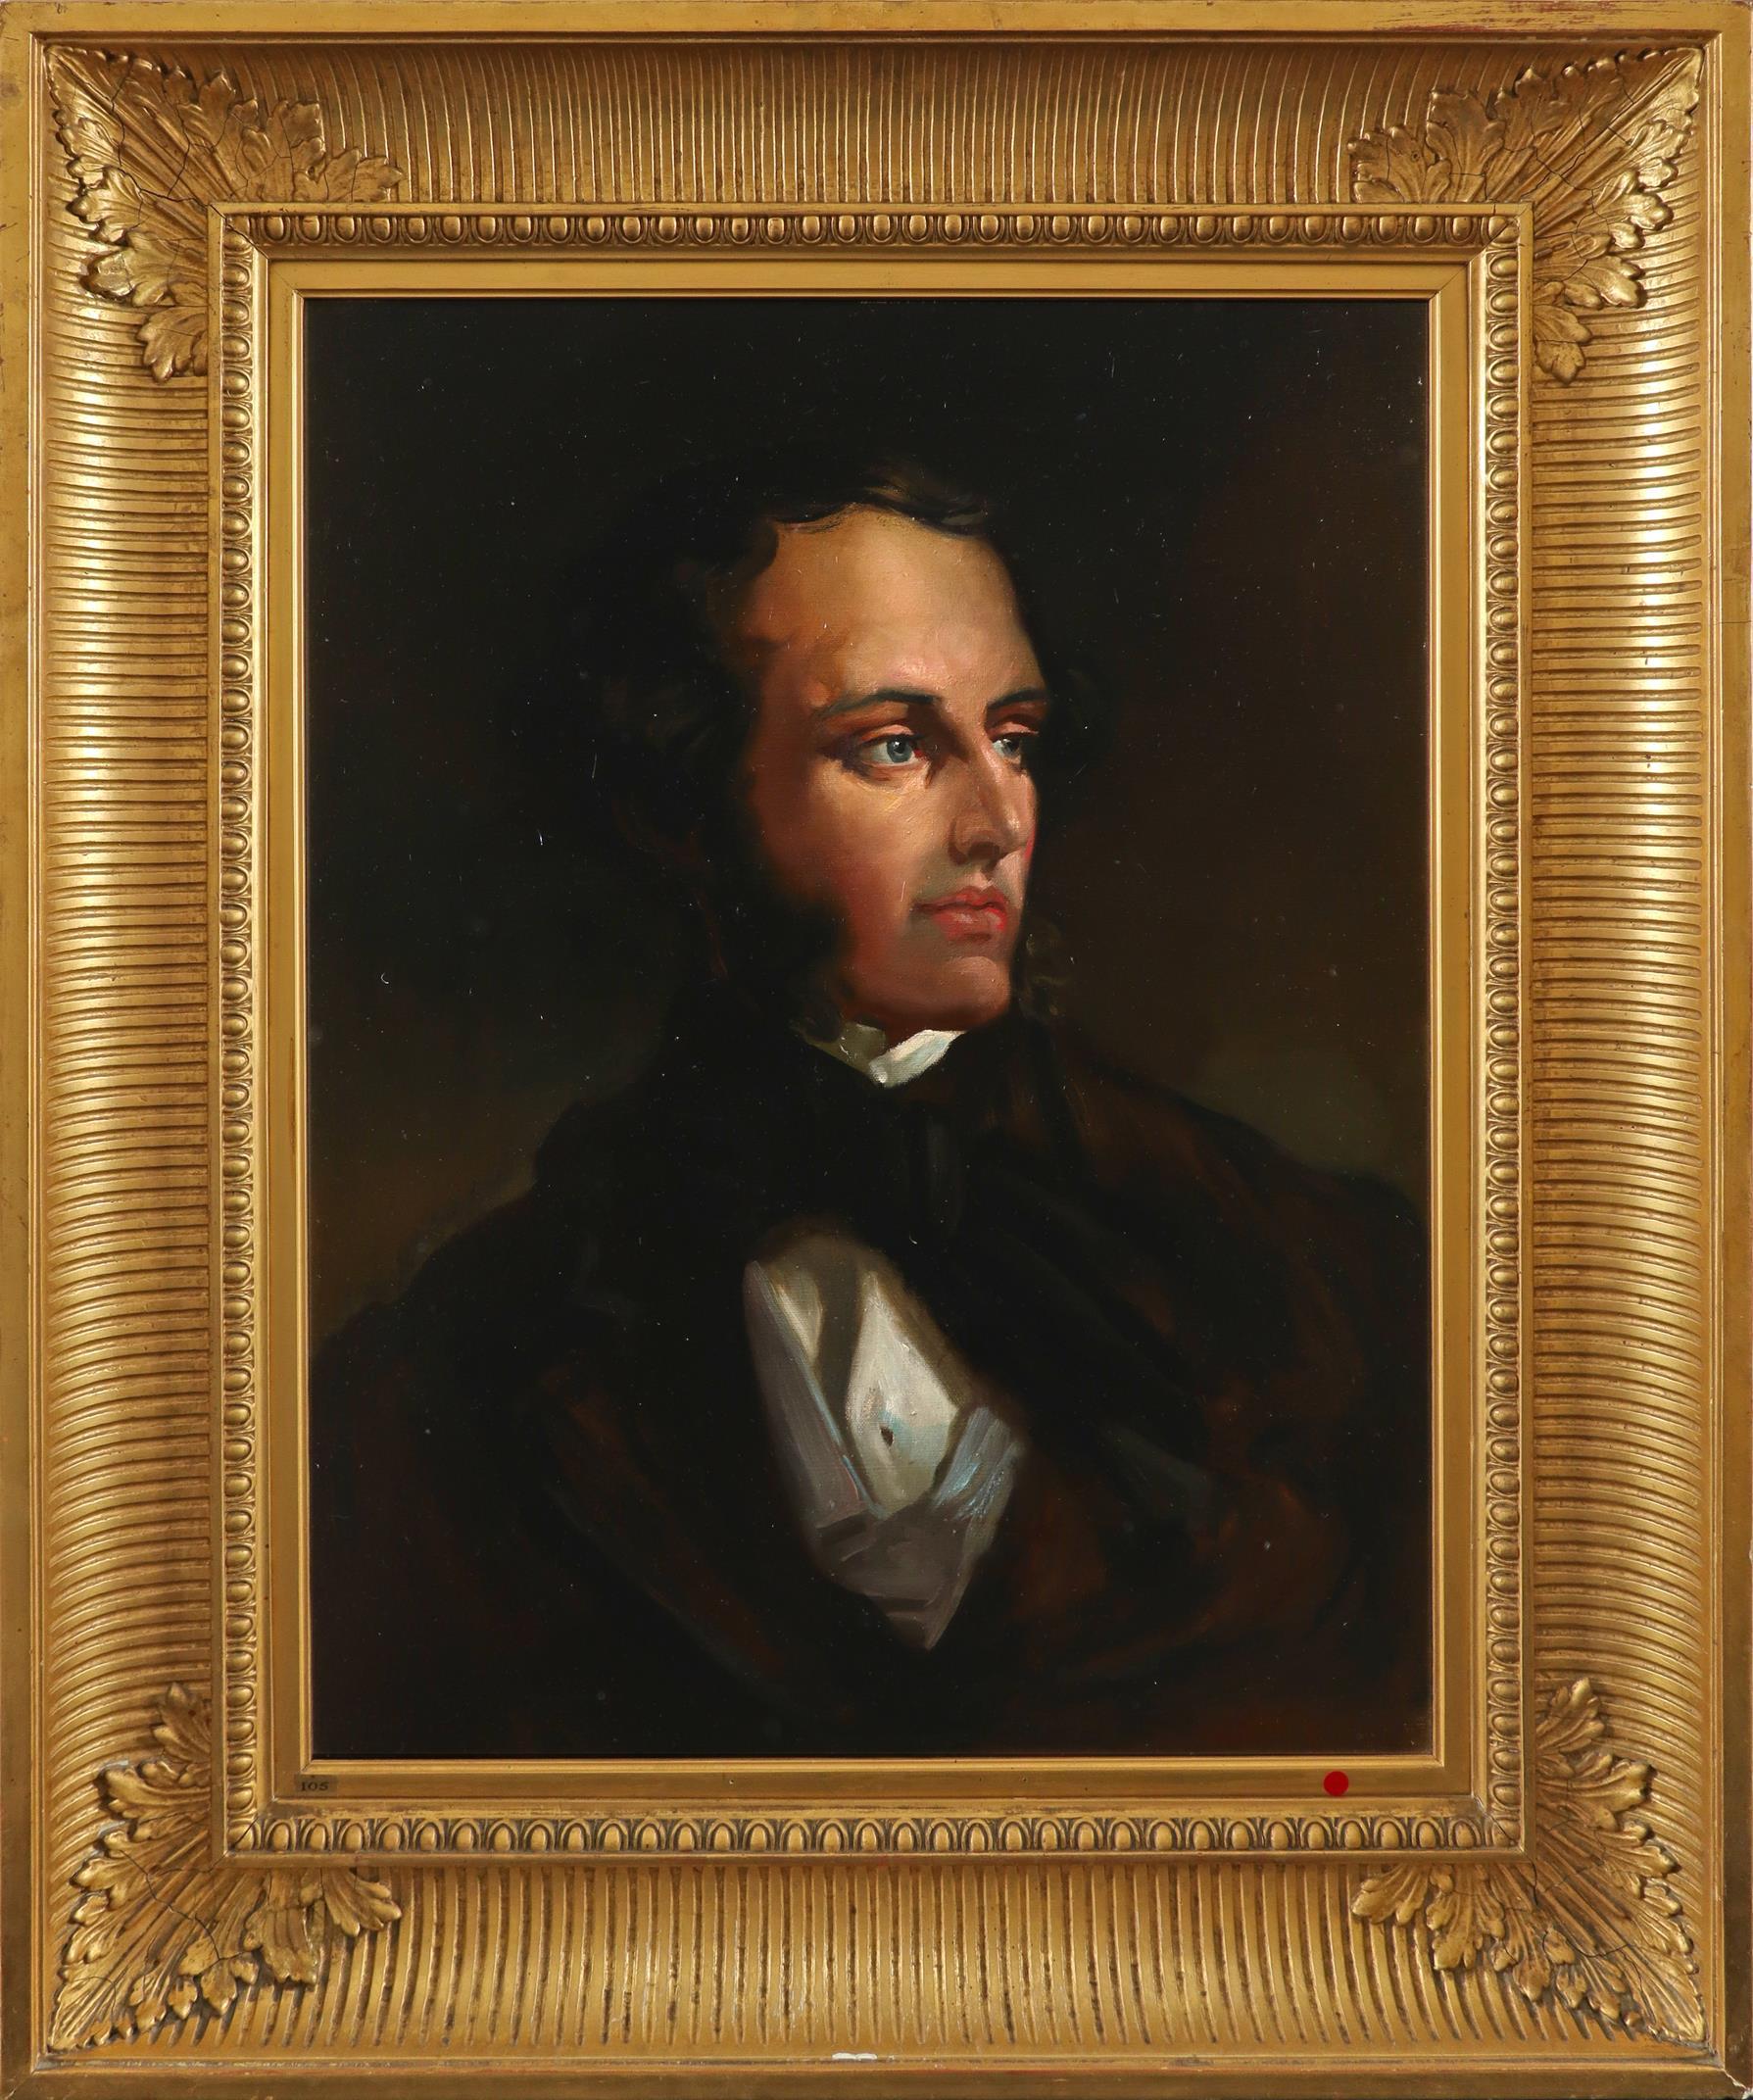 Seán Keating (Irish 1889-1977) after Sir William Orpen KBE, RA, RHA (Irish 1878-1931) Portrait of - Image 2 of 3